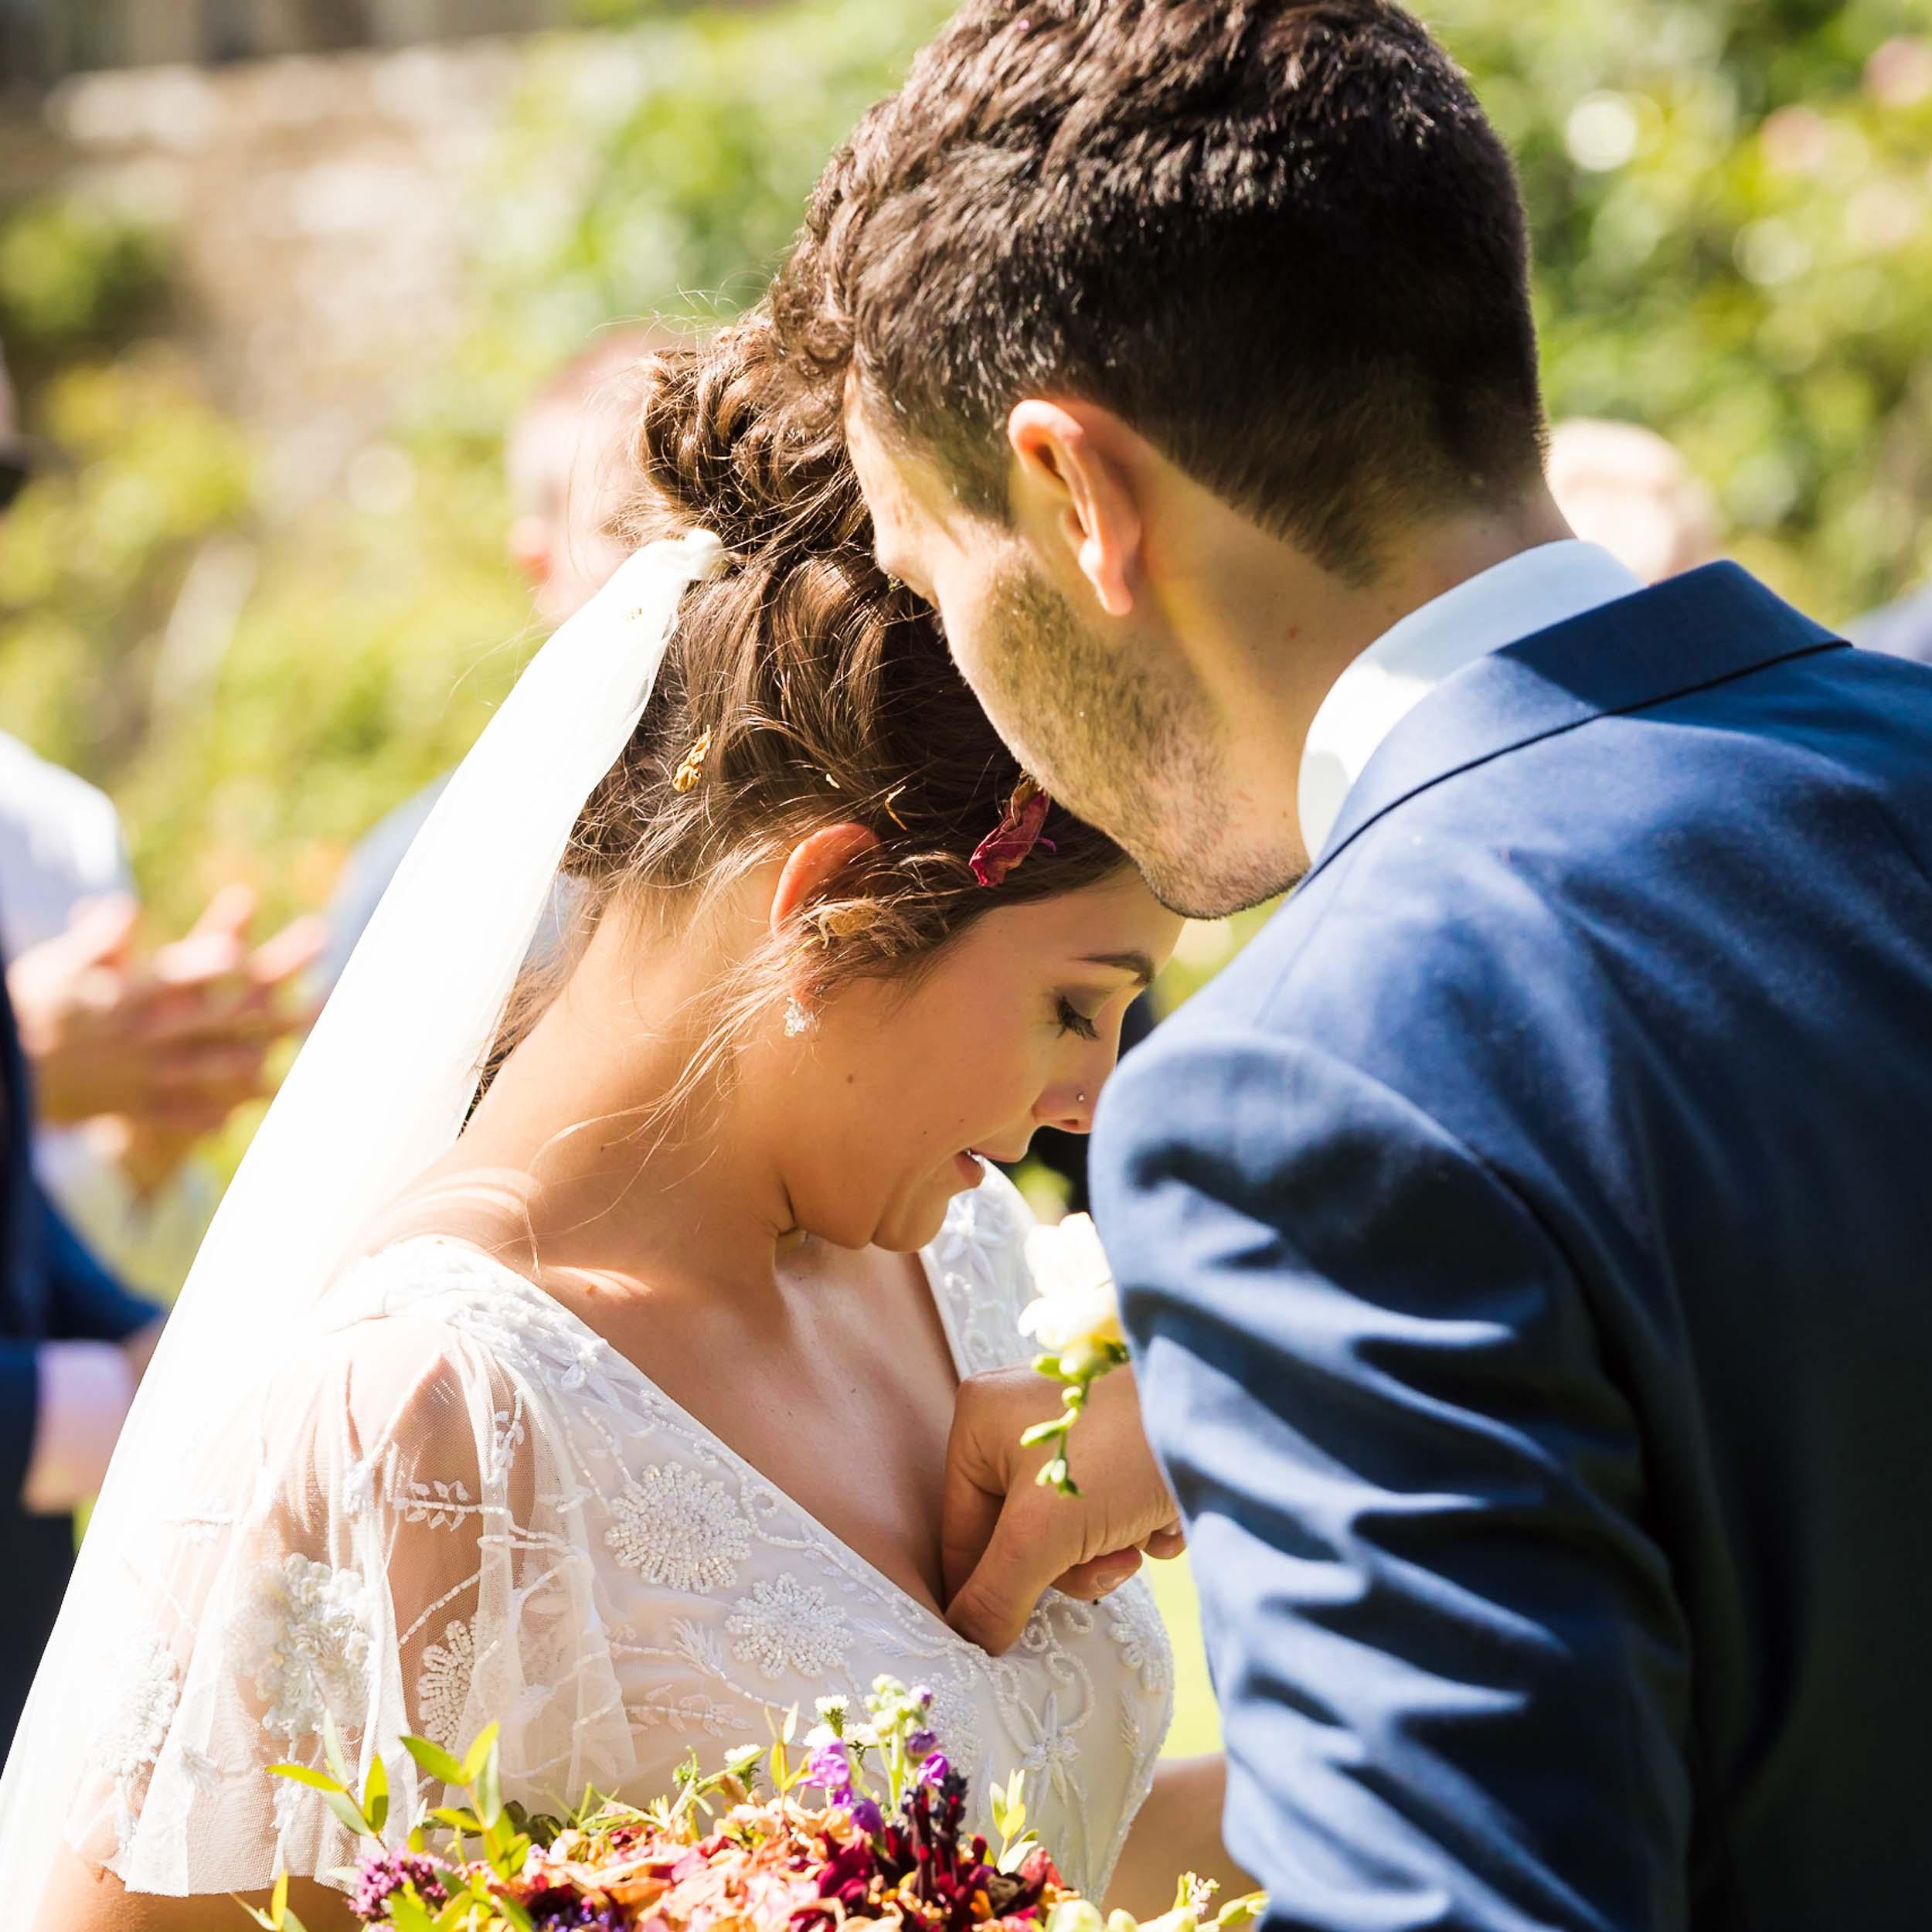 NC-20170805-2017-07-05_lara-and-nick-wedding-0719.jpg